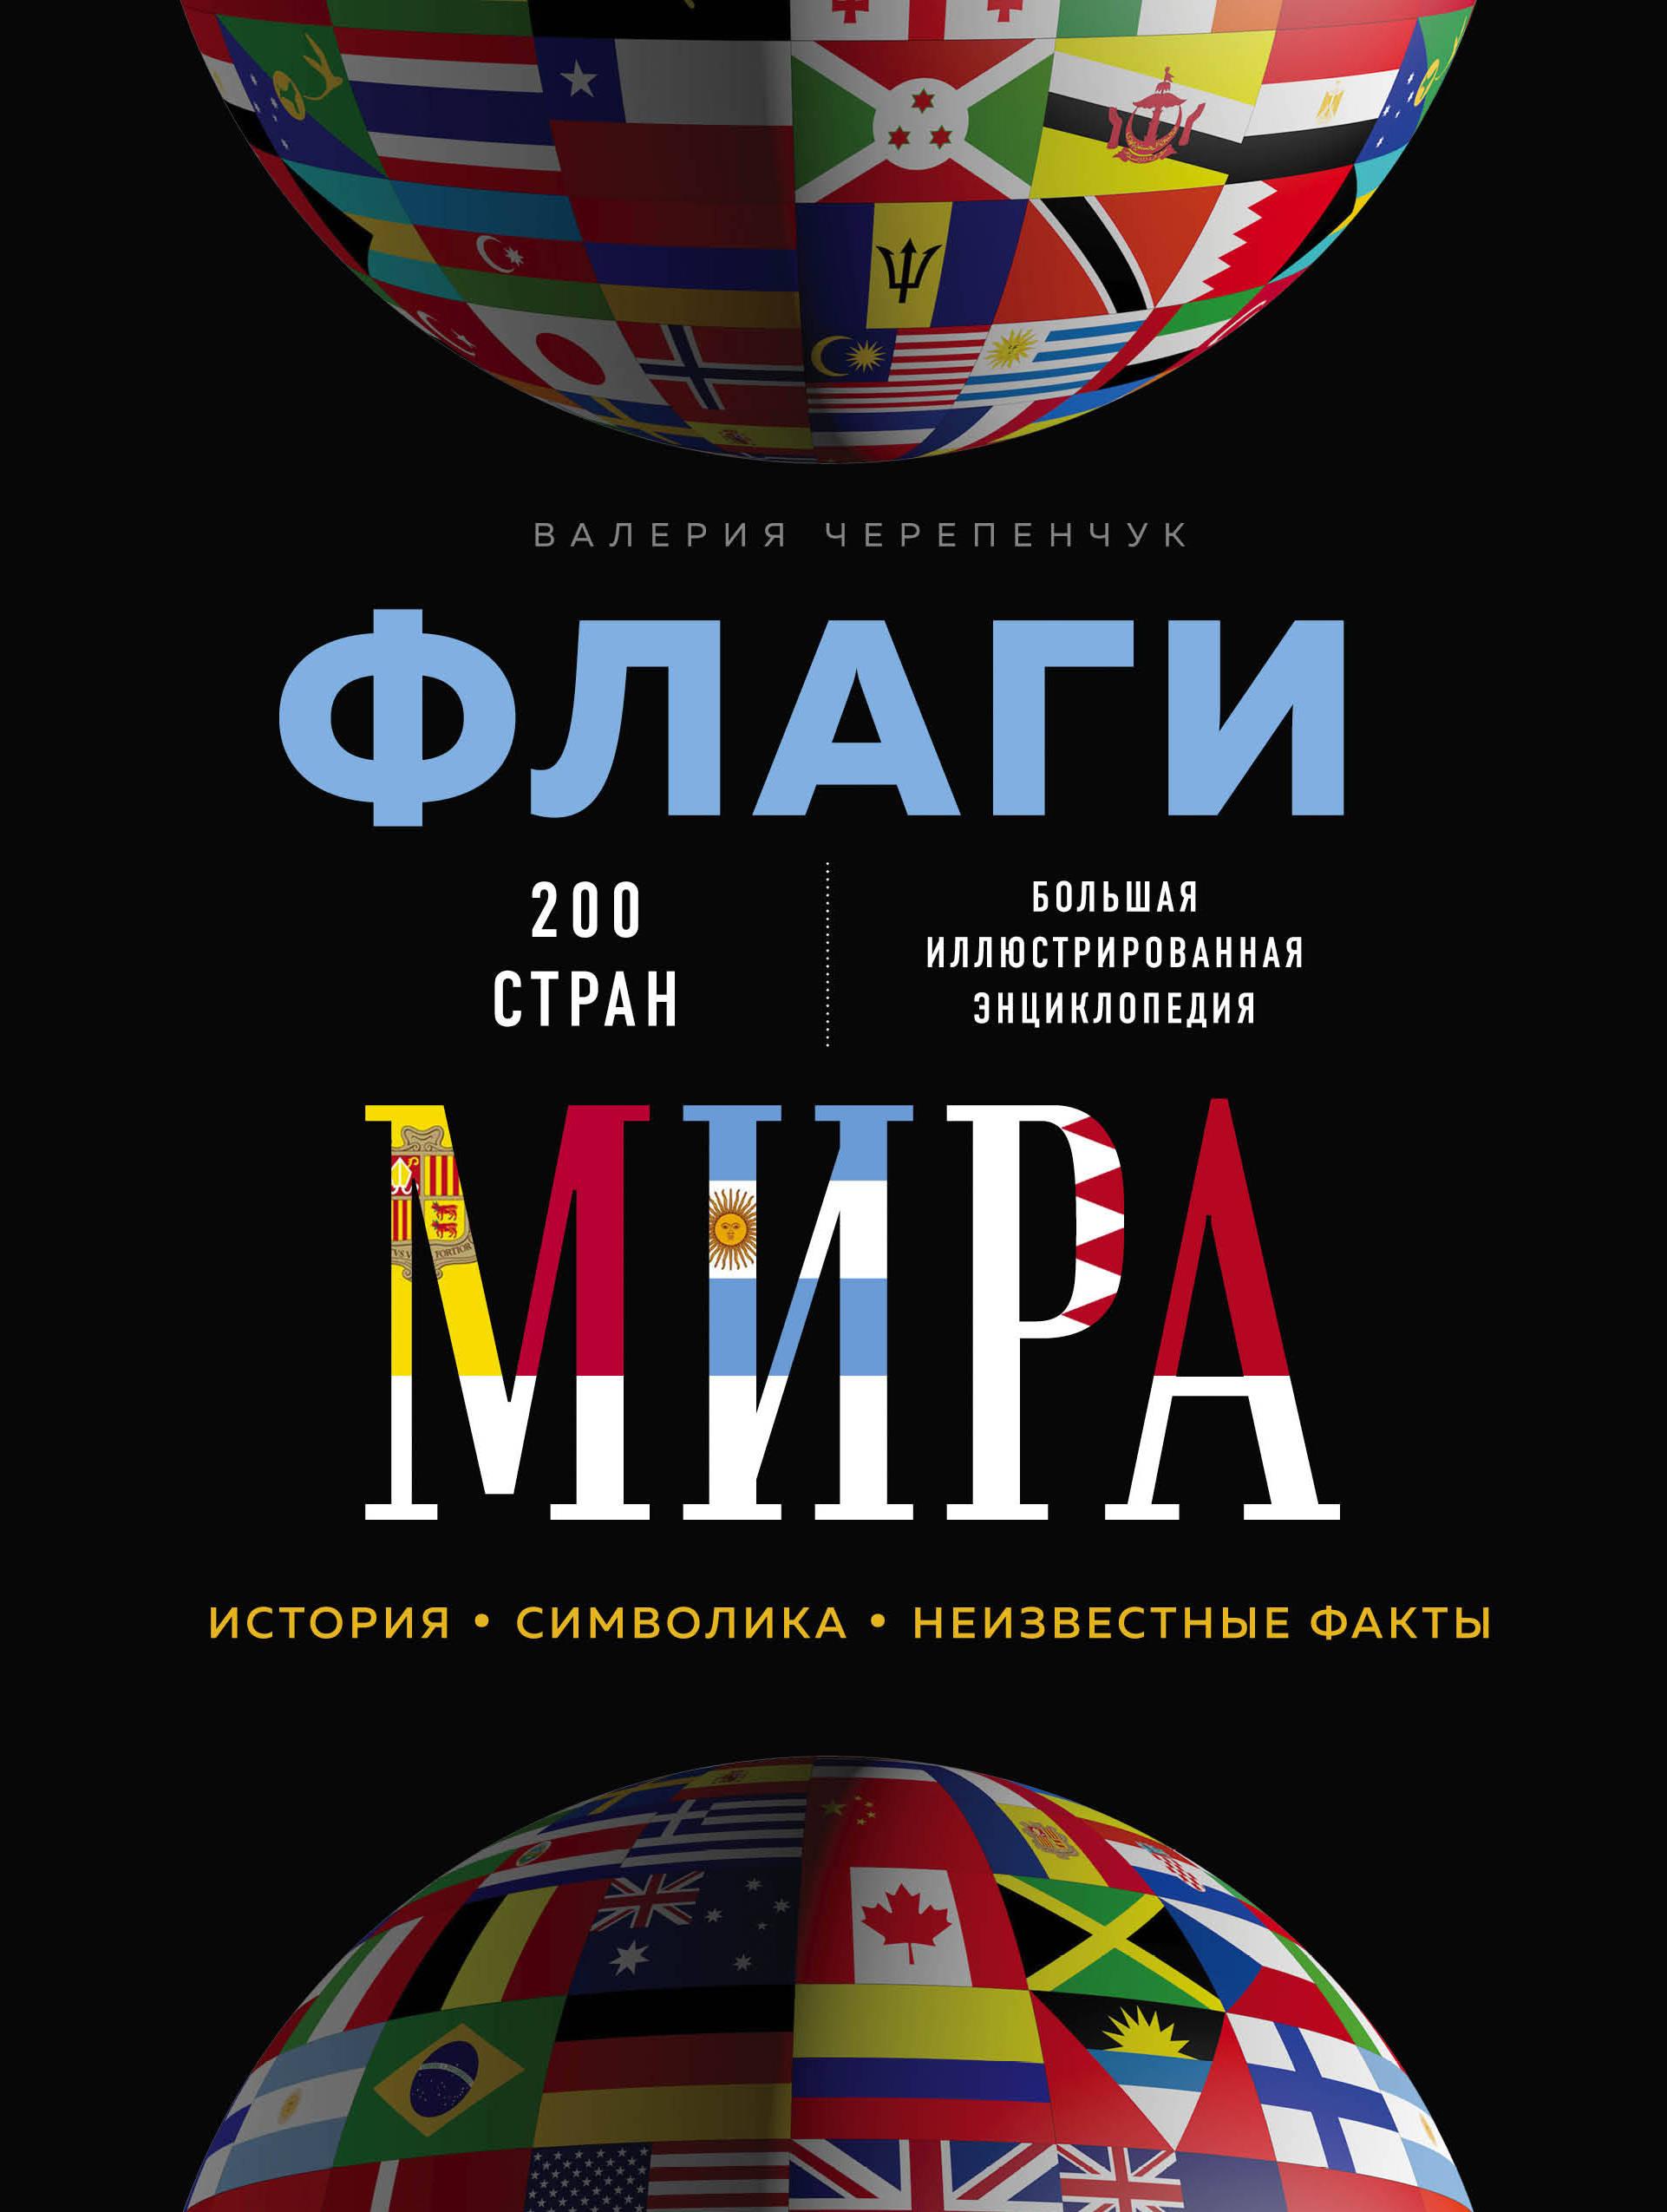 Flagi mira. Bolshaja illjustrirovannaja entsiklopedija